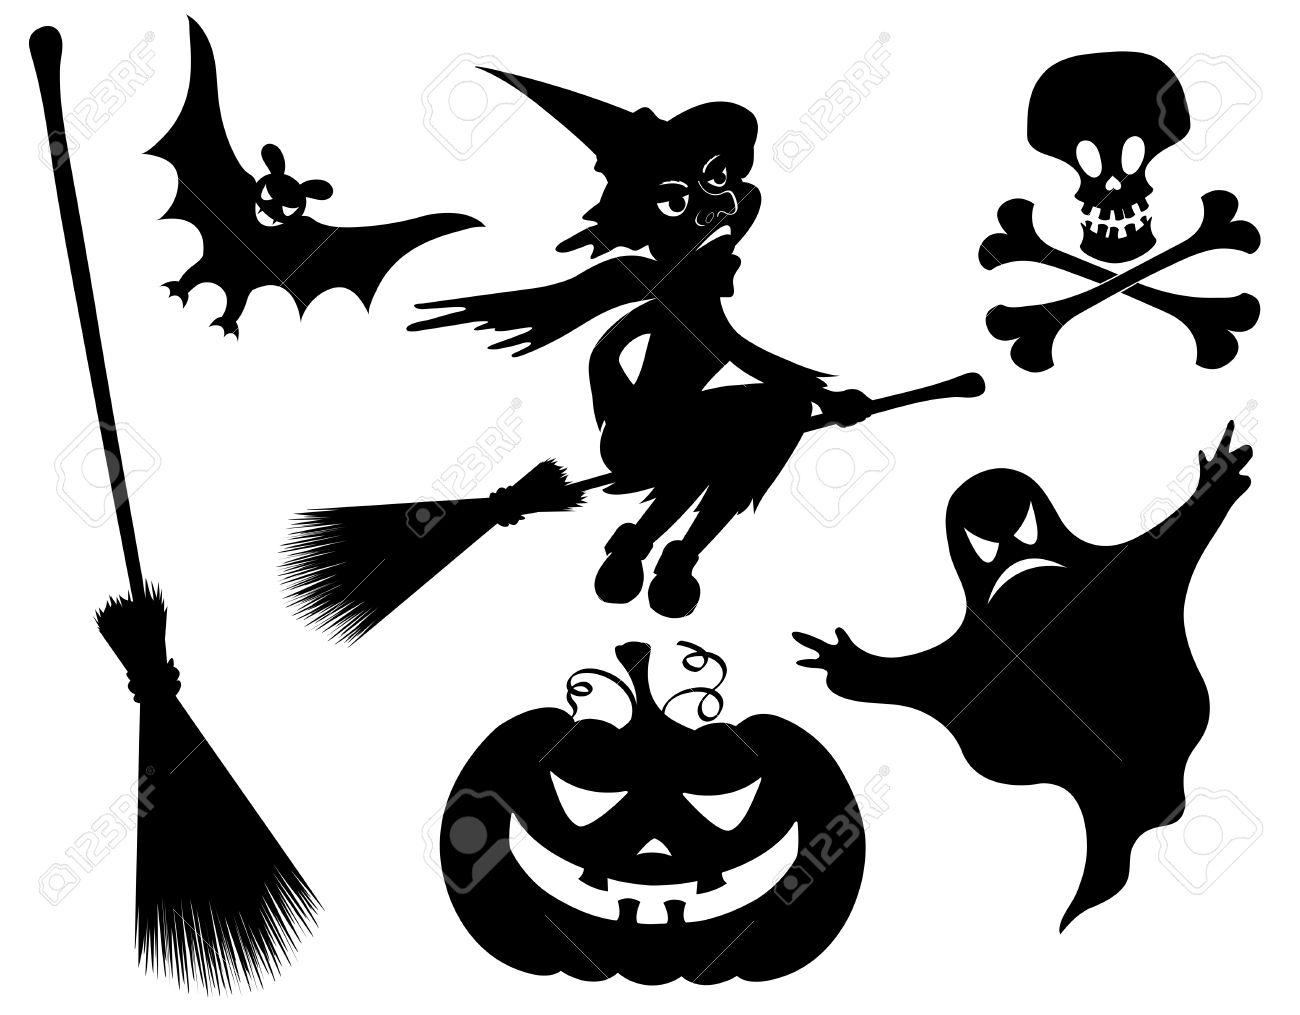 2 259 bat outline stock vector illustration and royalty free bat